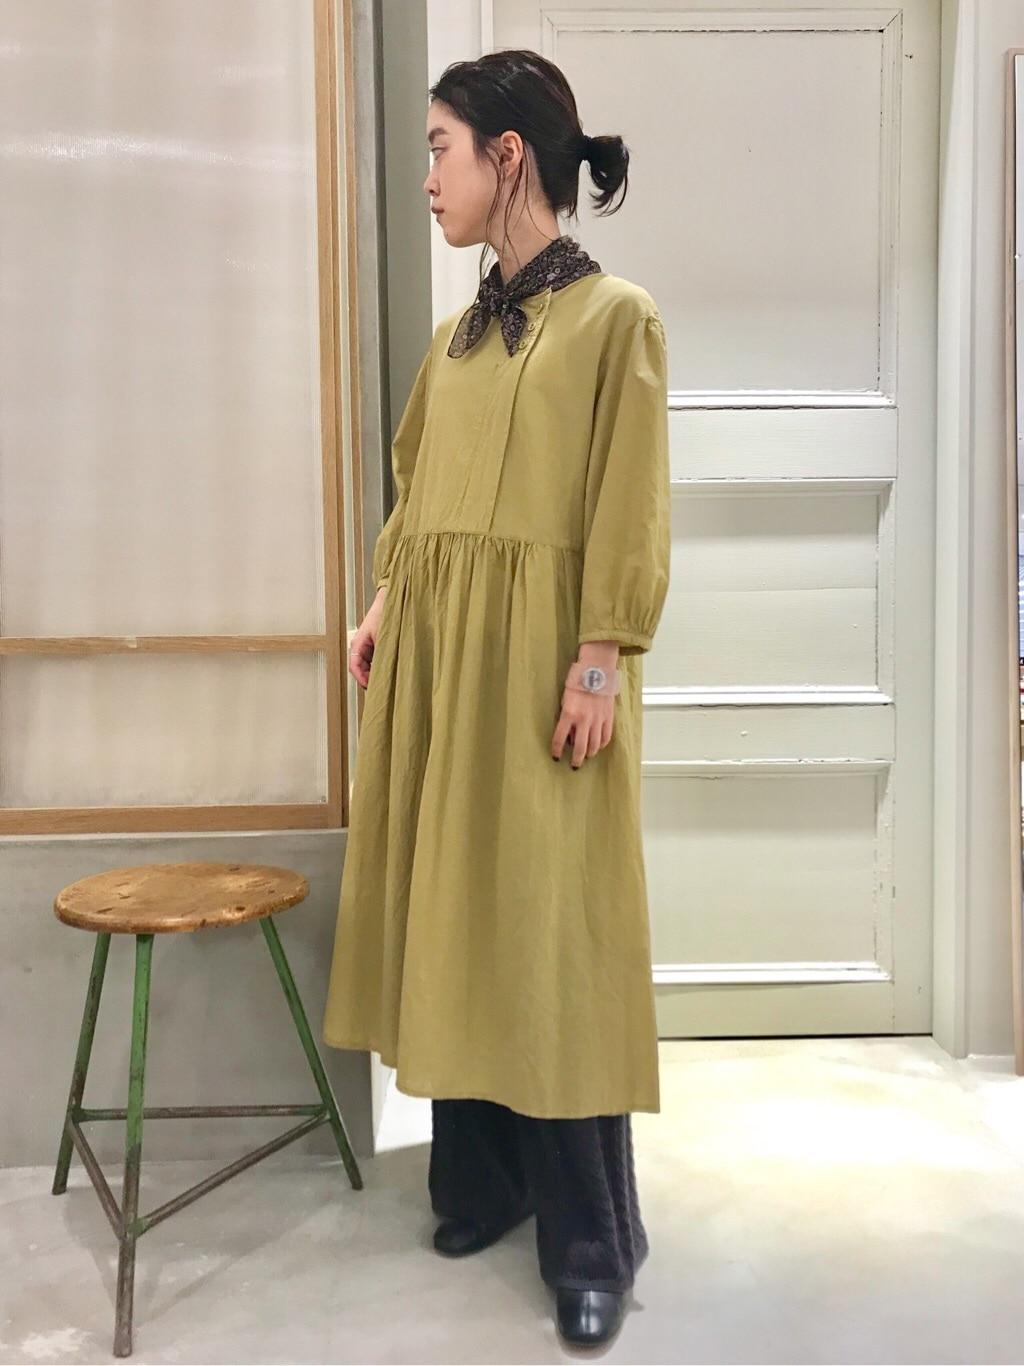 bulle de savon 渋谷スクランブルスクエア 身長:153cm 2020.06.25